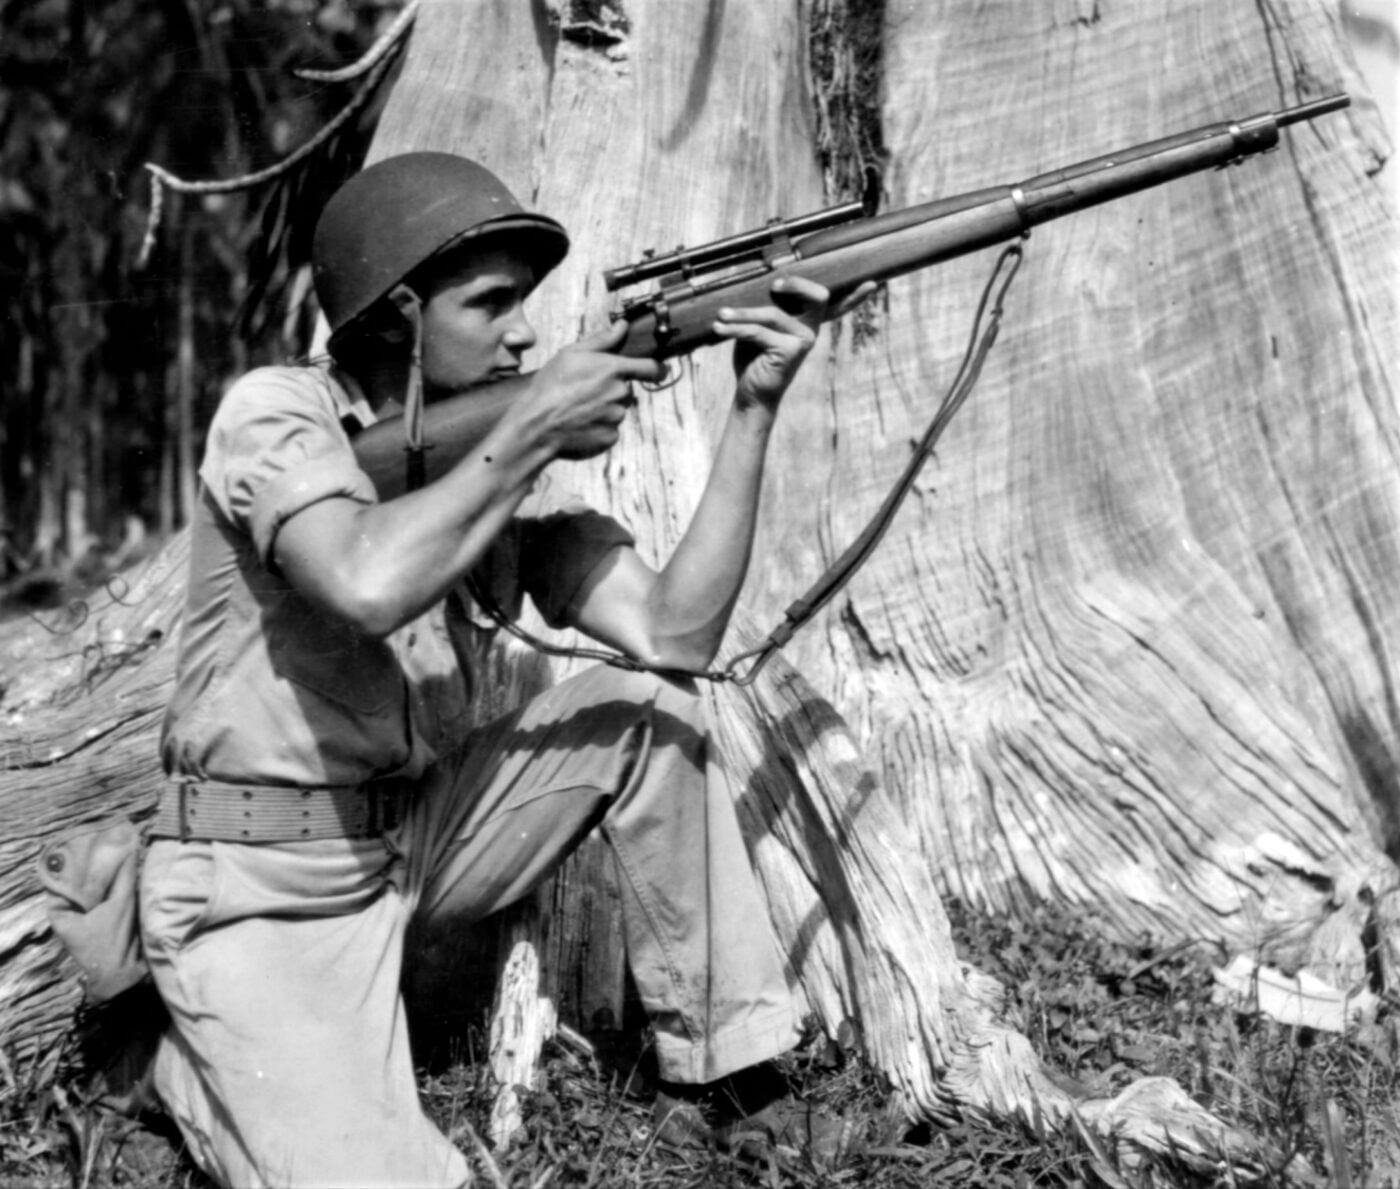 Springfield M1903A4 sniper rifle in World War II